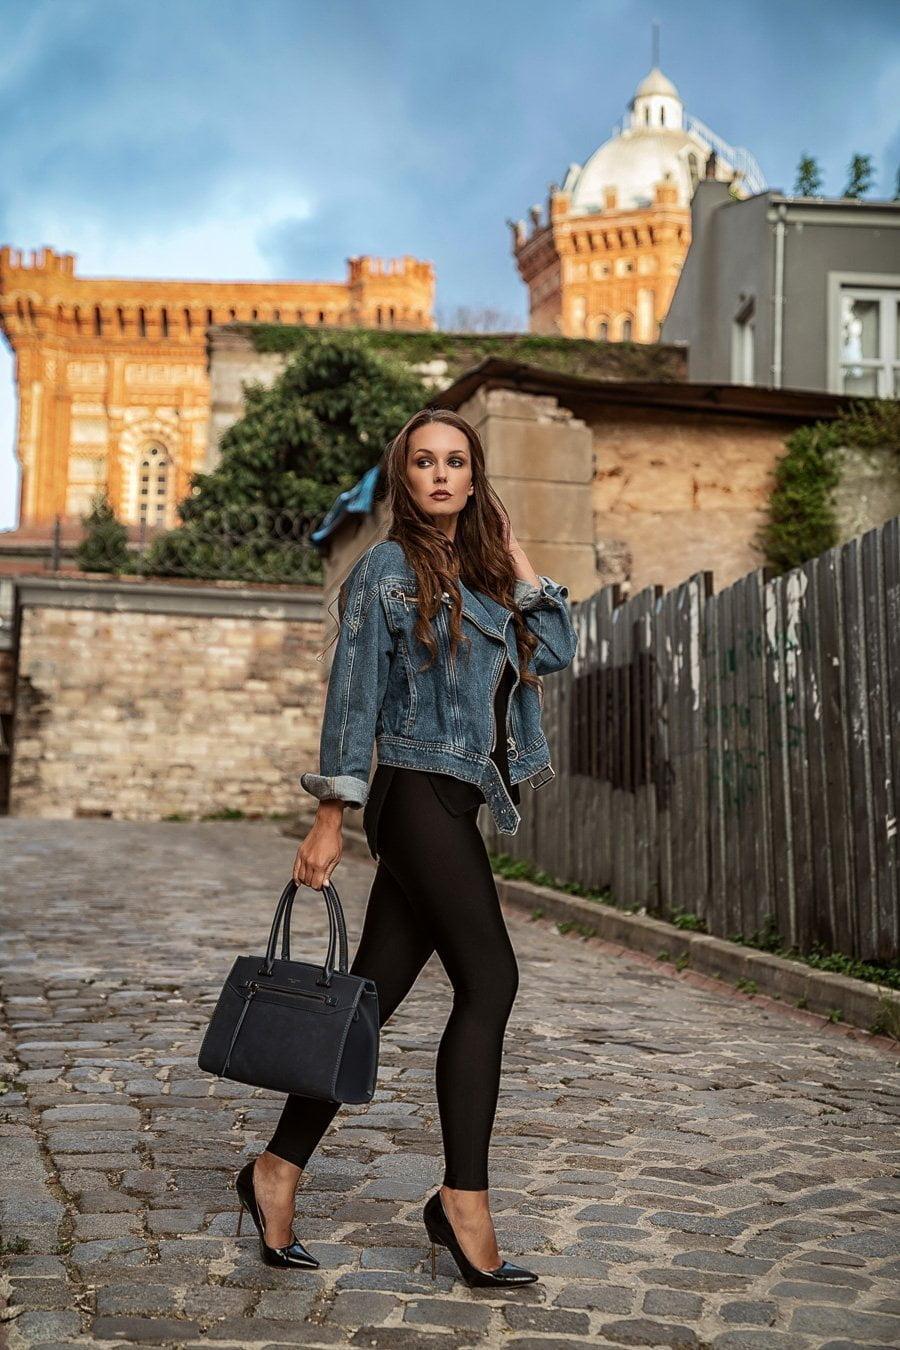 Moda Çekimi - Editorial - Beauty moda tekstil burakbulutfotografatolyesi 29